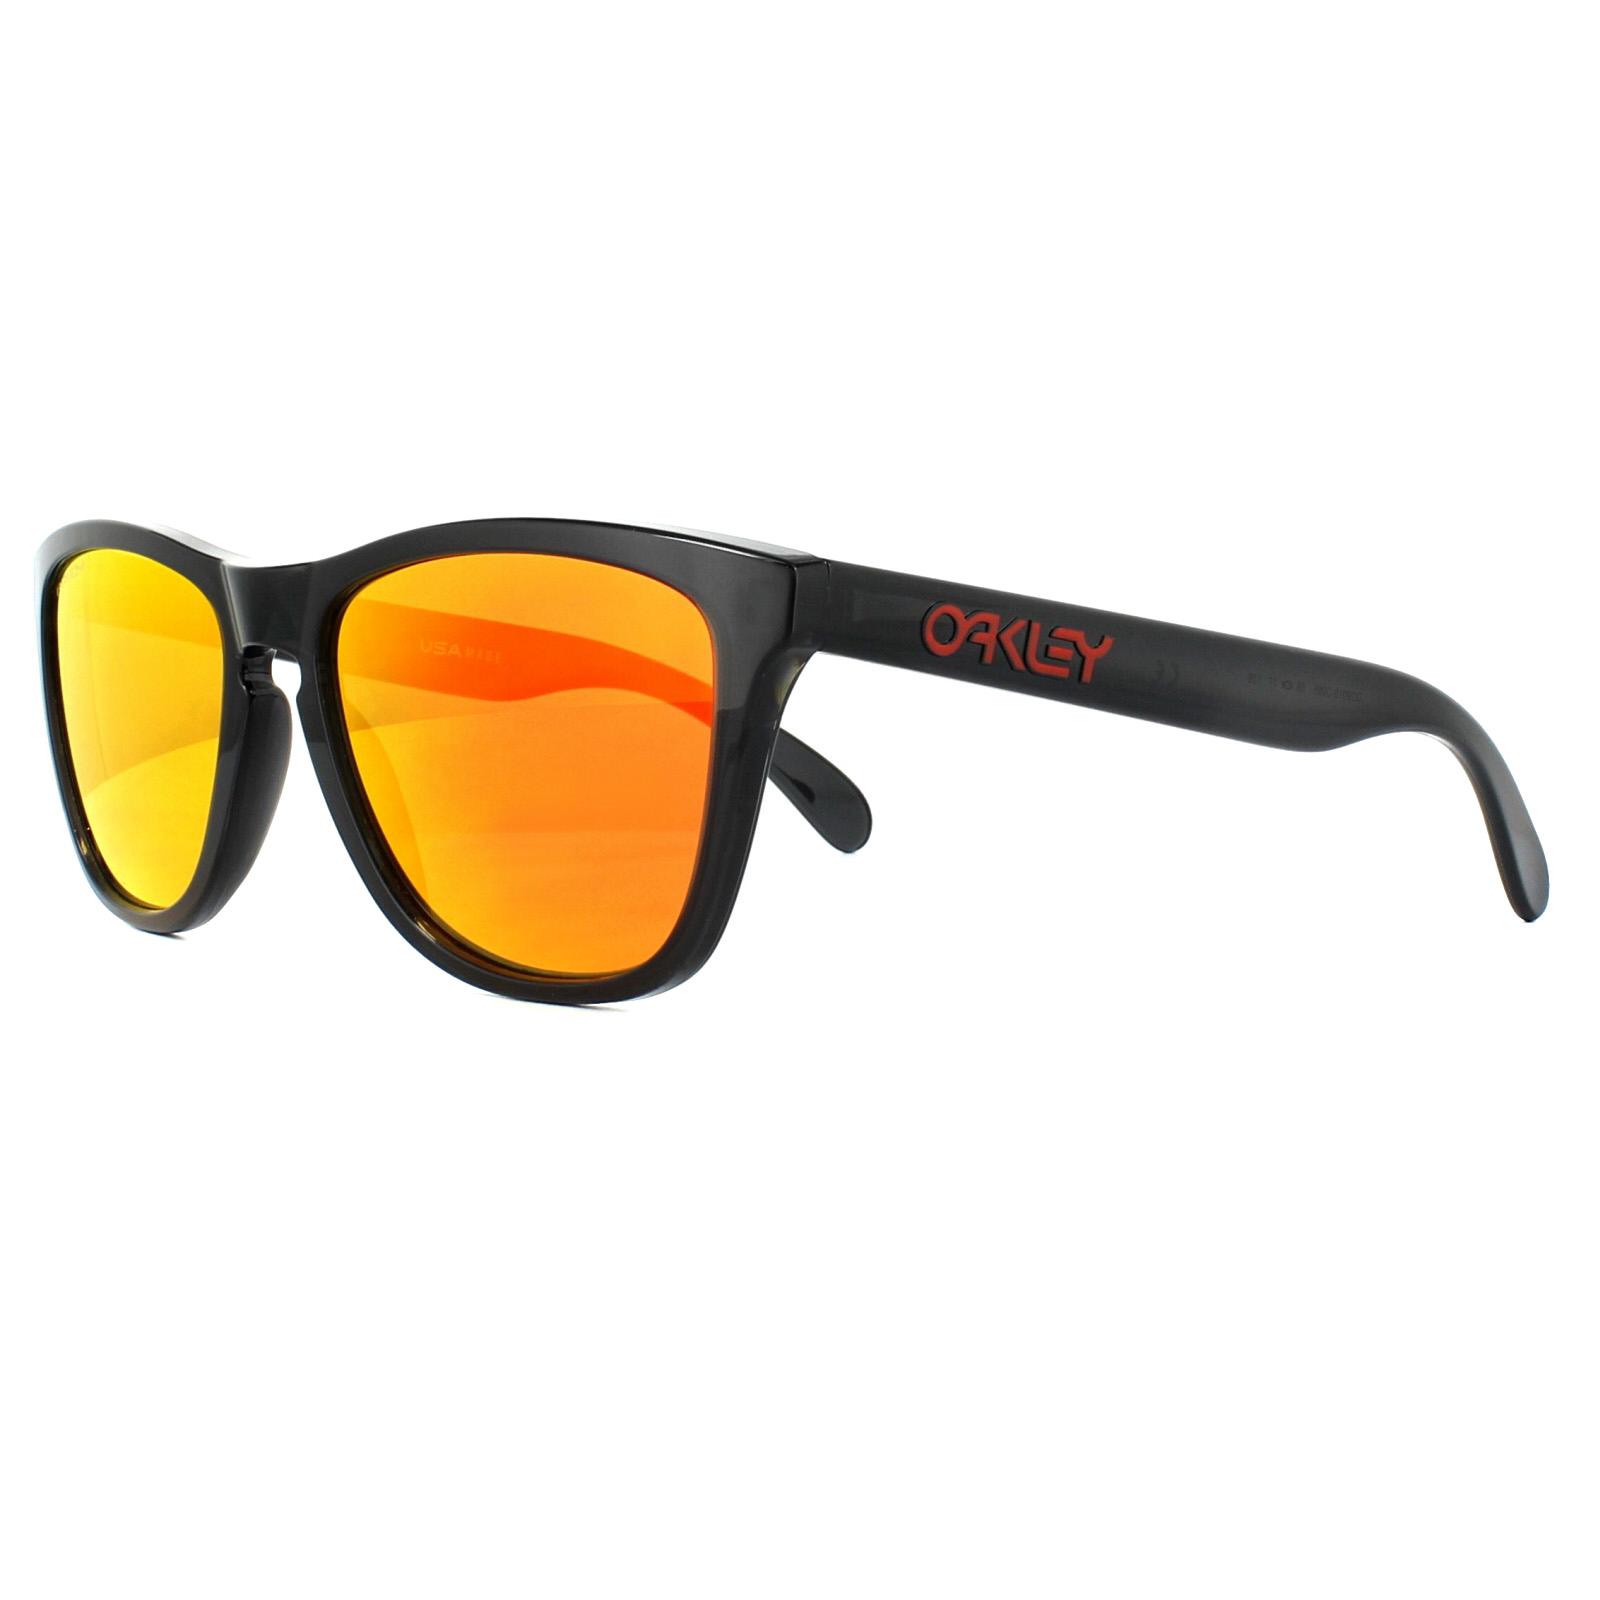 c9310d7bfd Sentinel Oakley Sunglasses Frogskins OO9013-C9 Black Ink Prizm Ruby